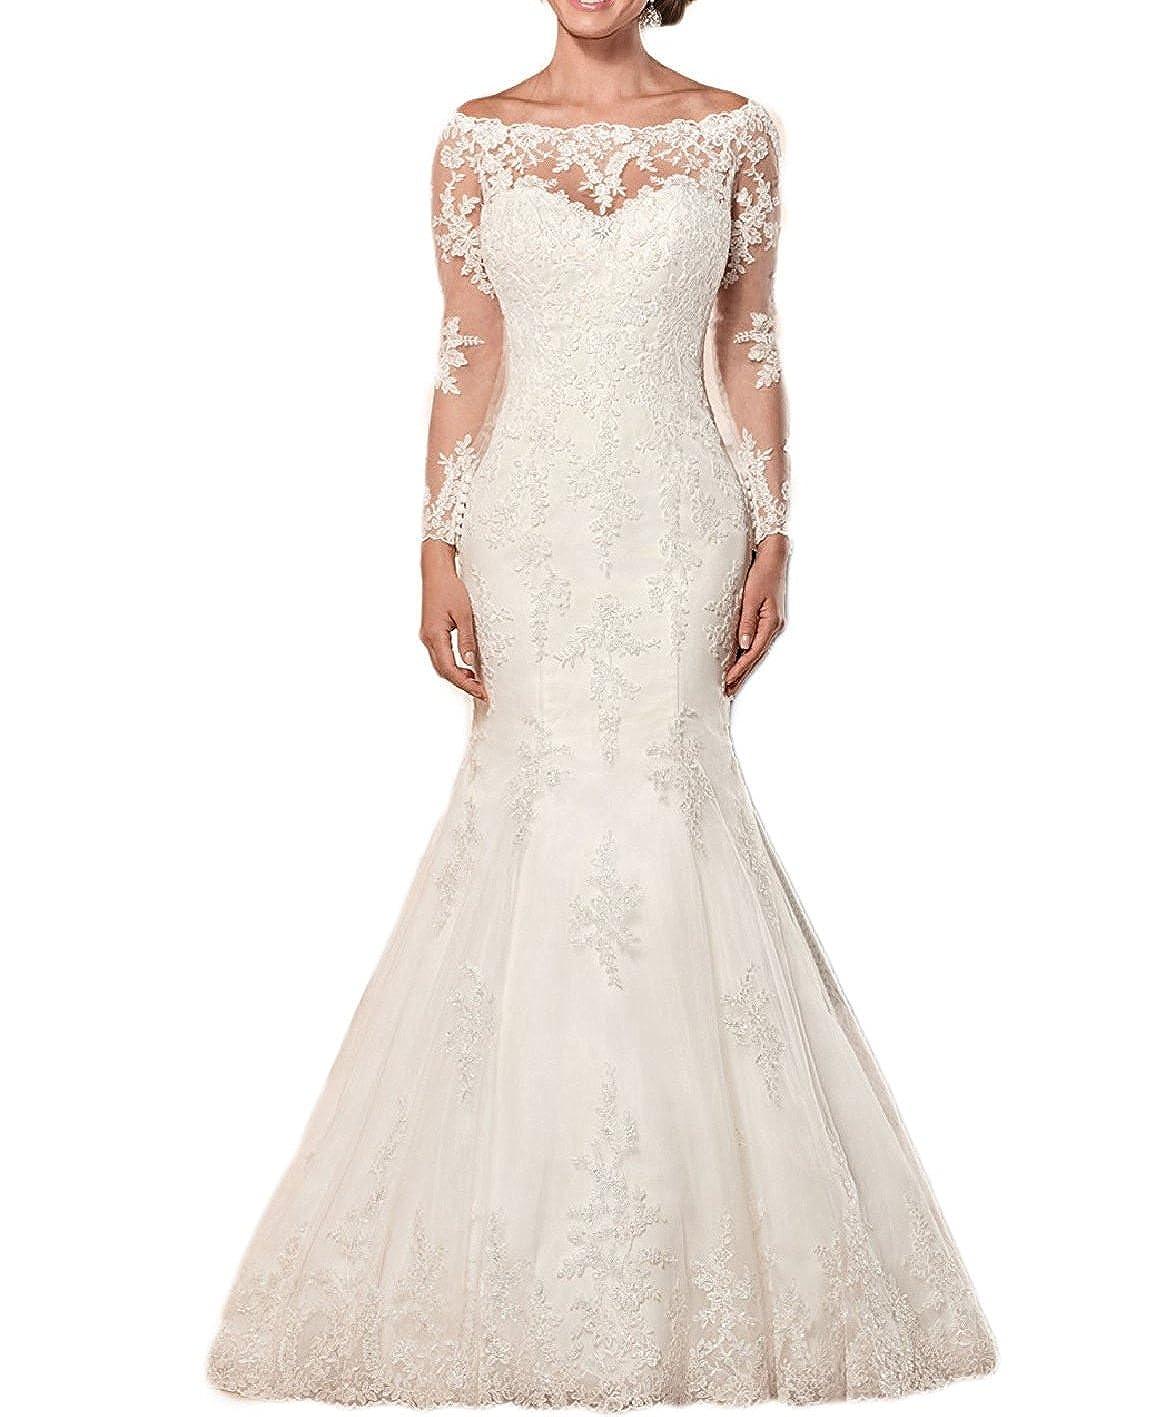 Wendybridal Womens Off Shoulder Lace Mermaid Wedding Bridal Dresses